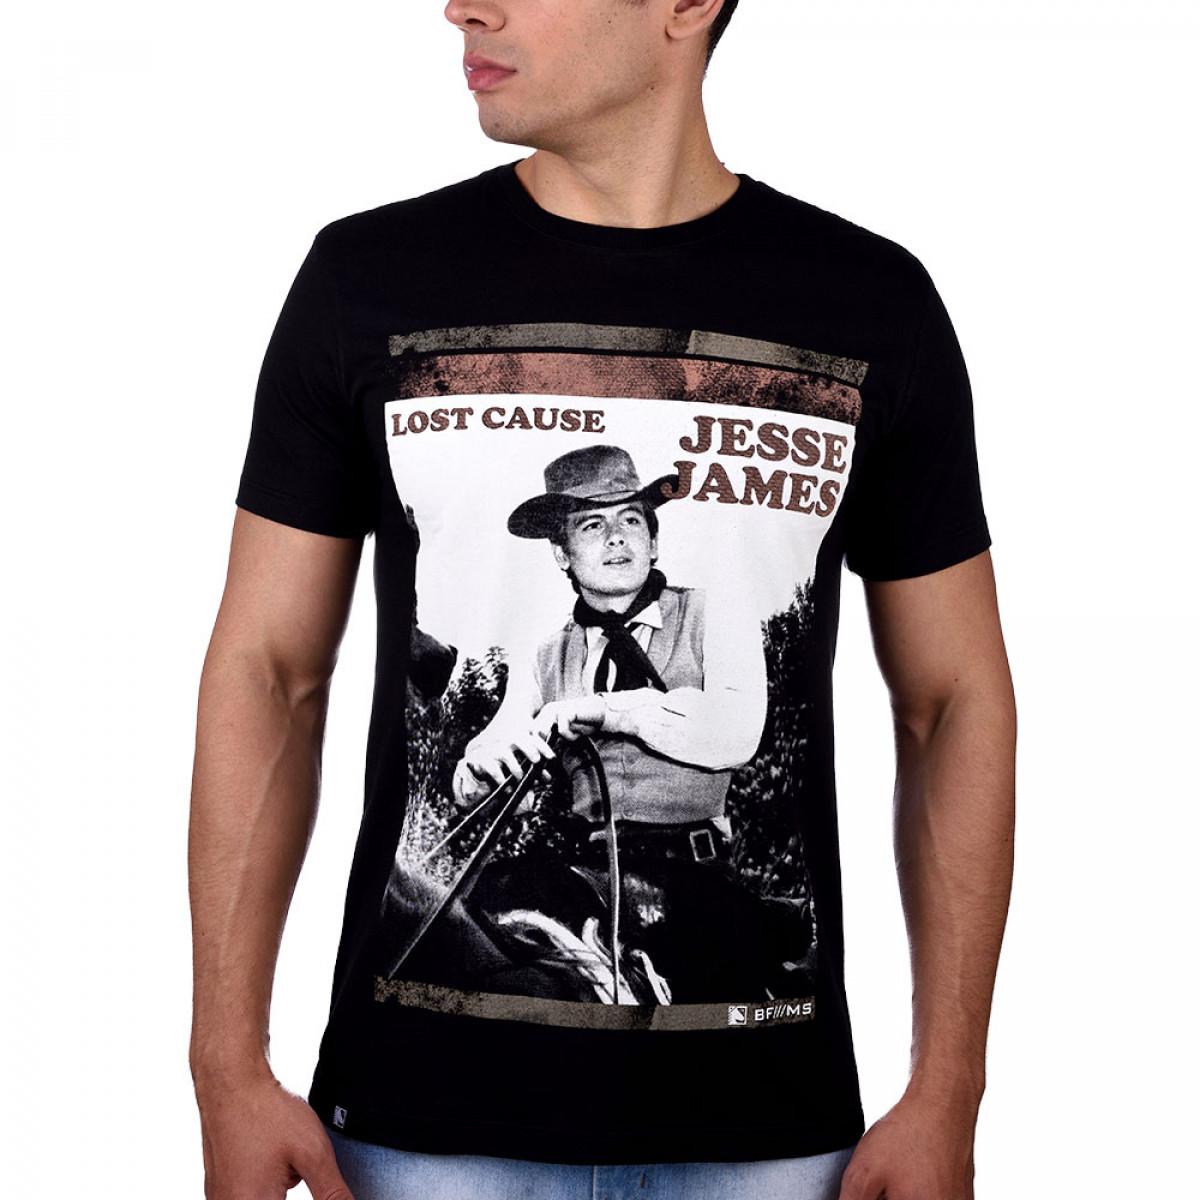 8ff75249a Camiseta Jesse James Preta - BF   MS